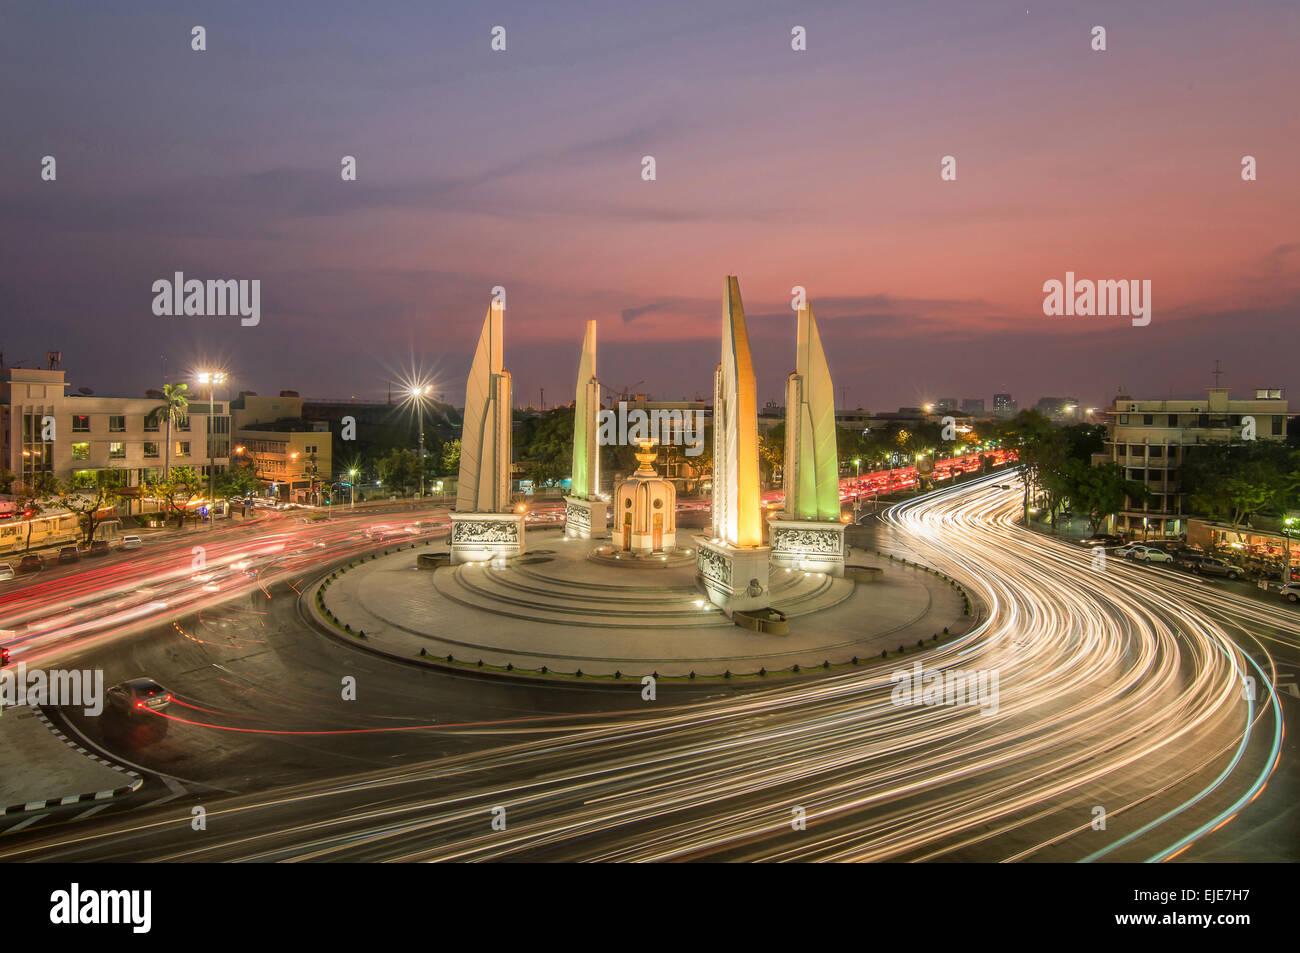 The Democracy Monument at twilight time at Bangkok,Thailand - Stock Image